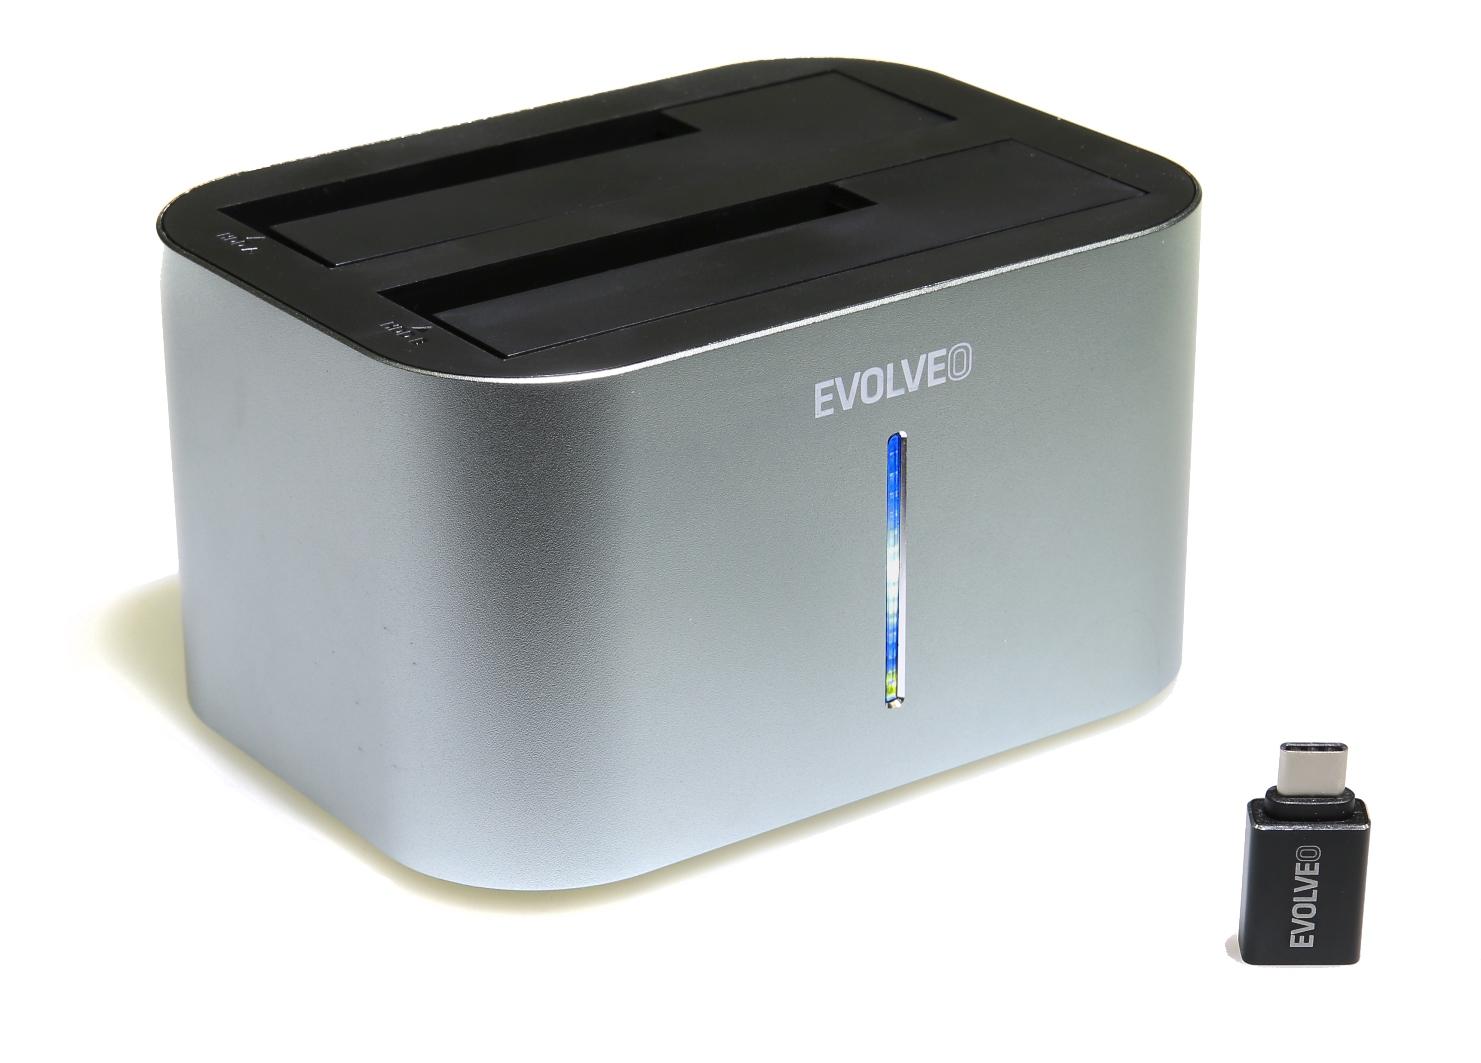 EVOLVEO Dion 2, 10Gb/s, dokovací stanice, USB 3.1 A + redukce USB A/USB C